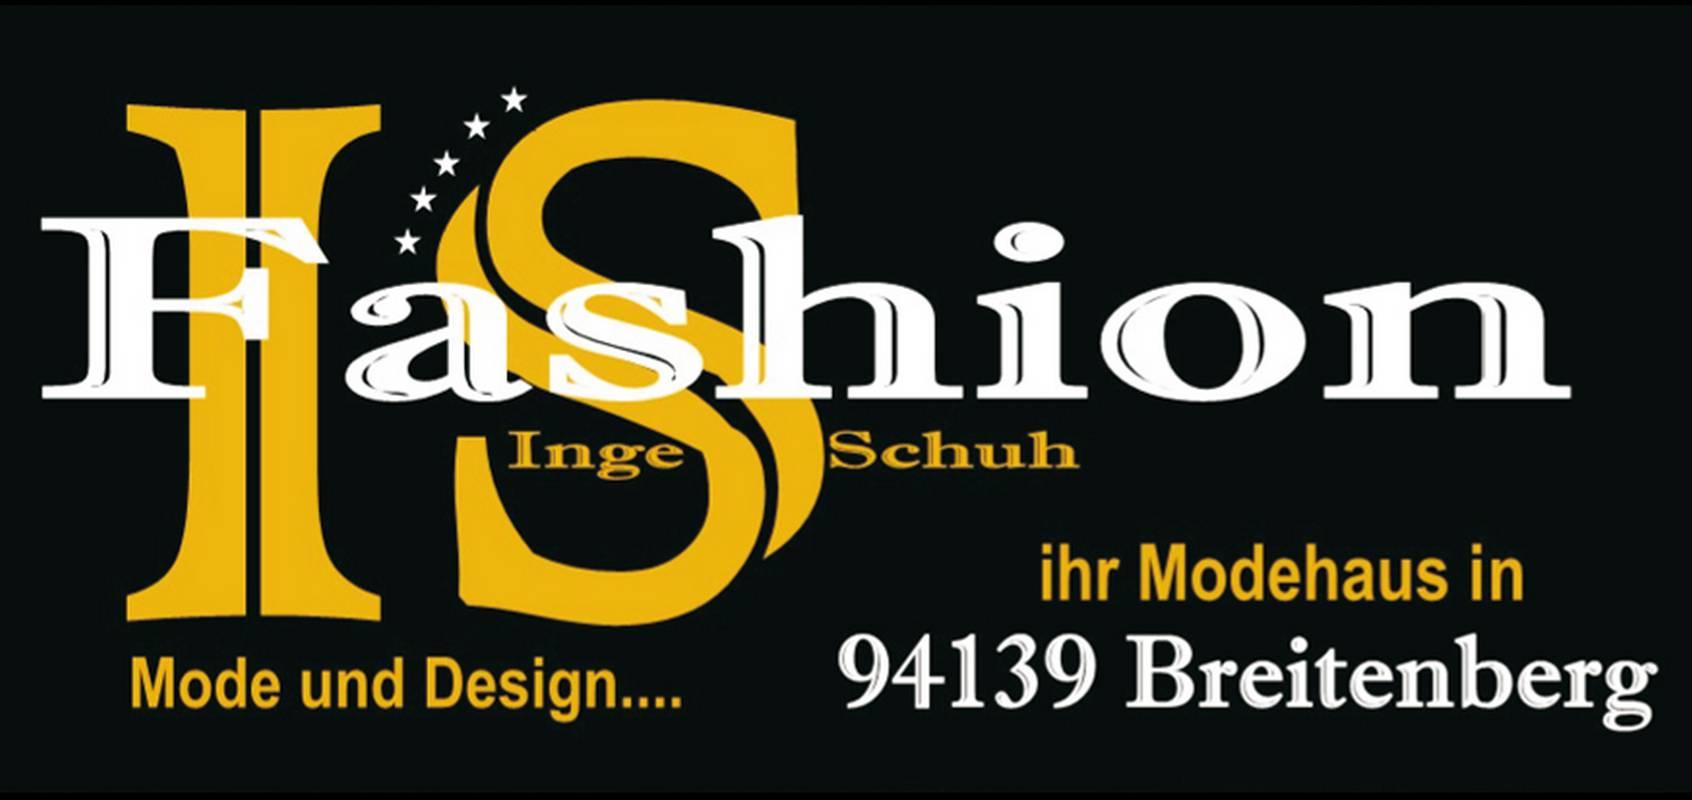 IS-FashionAm Gegenbach 594139 Breitenberg